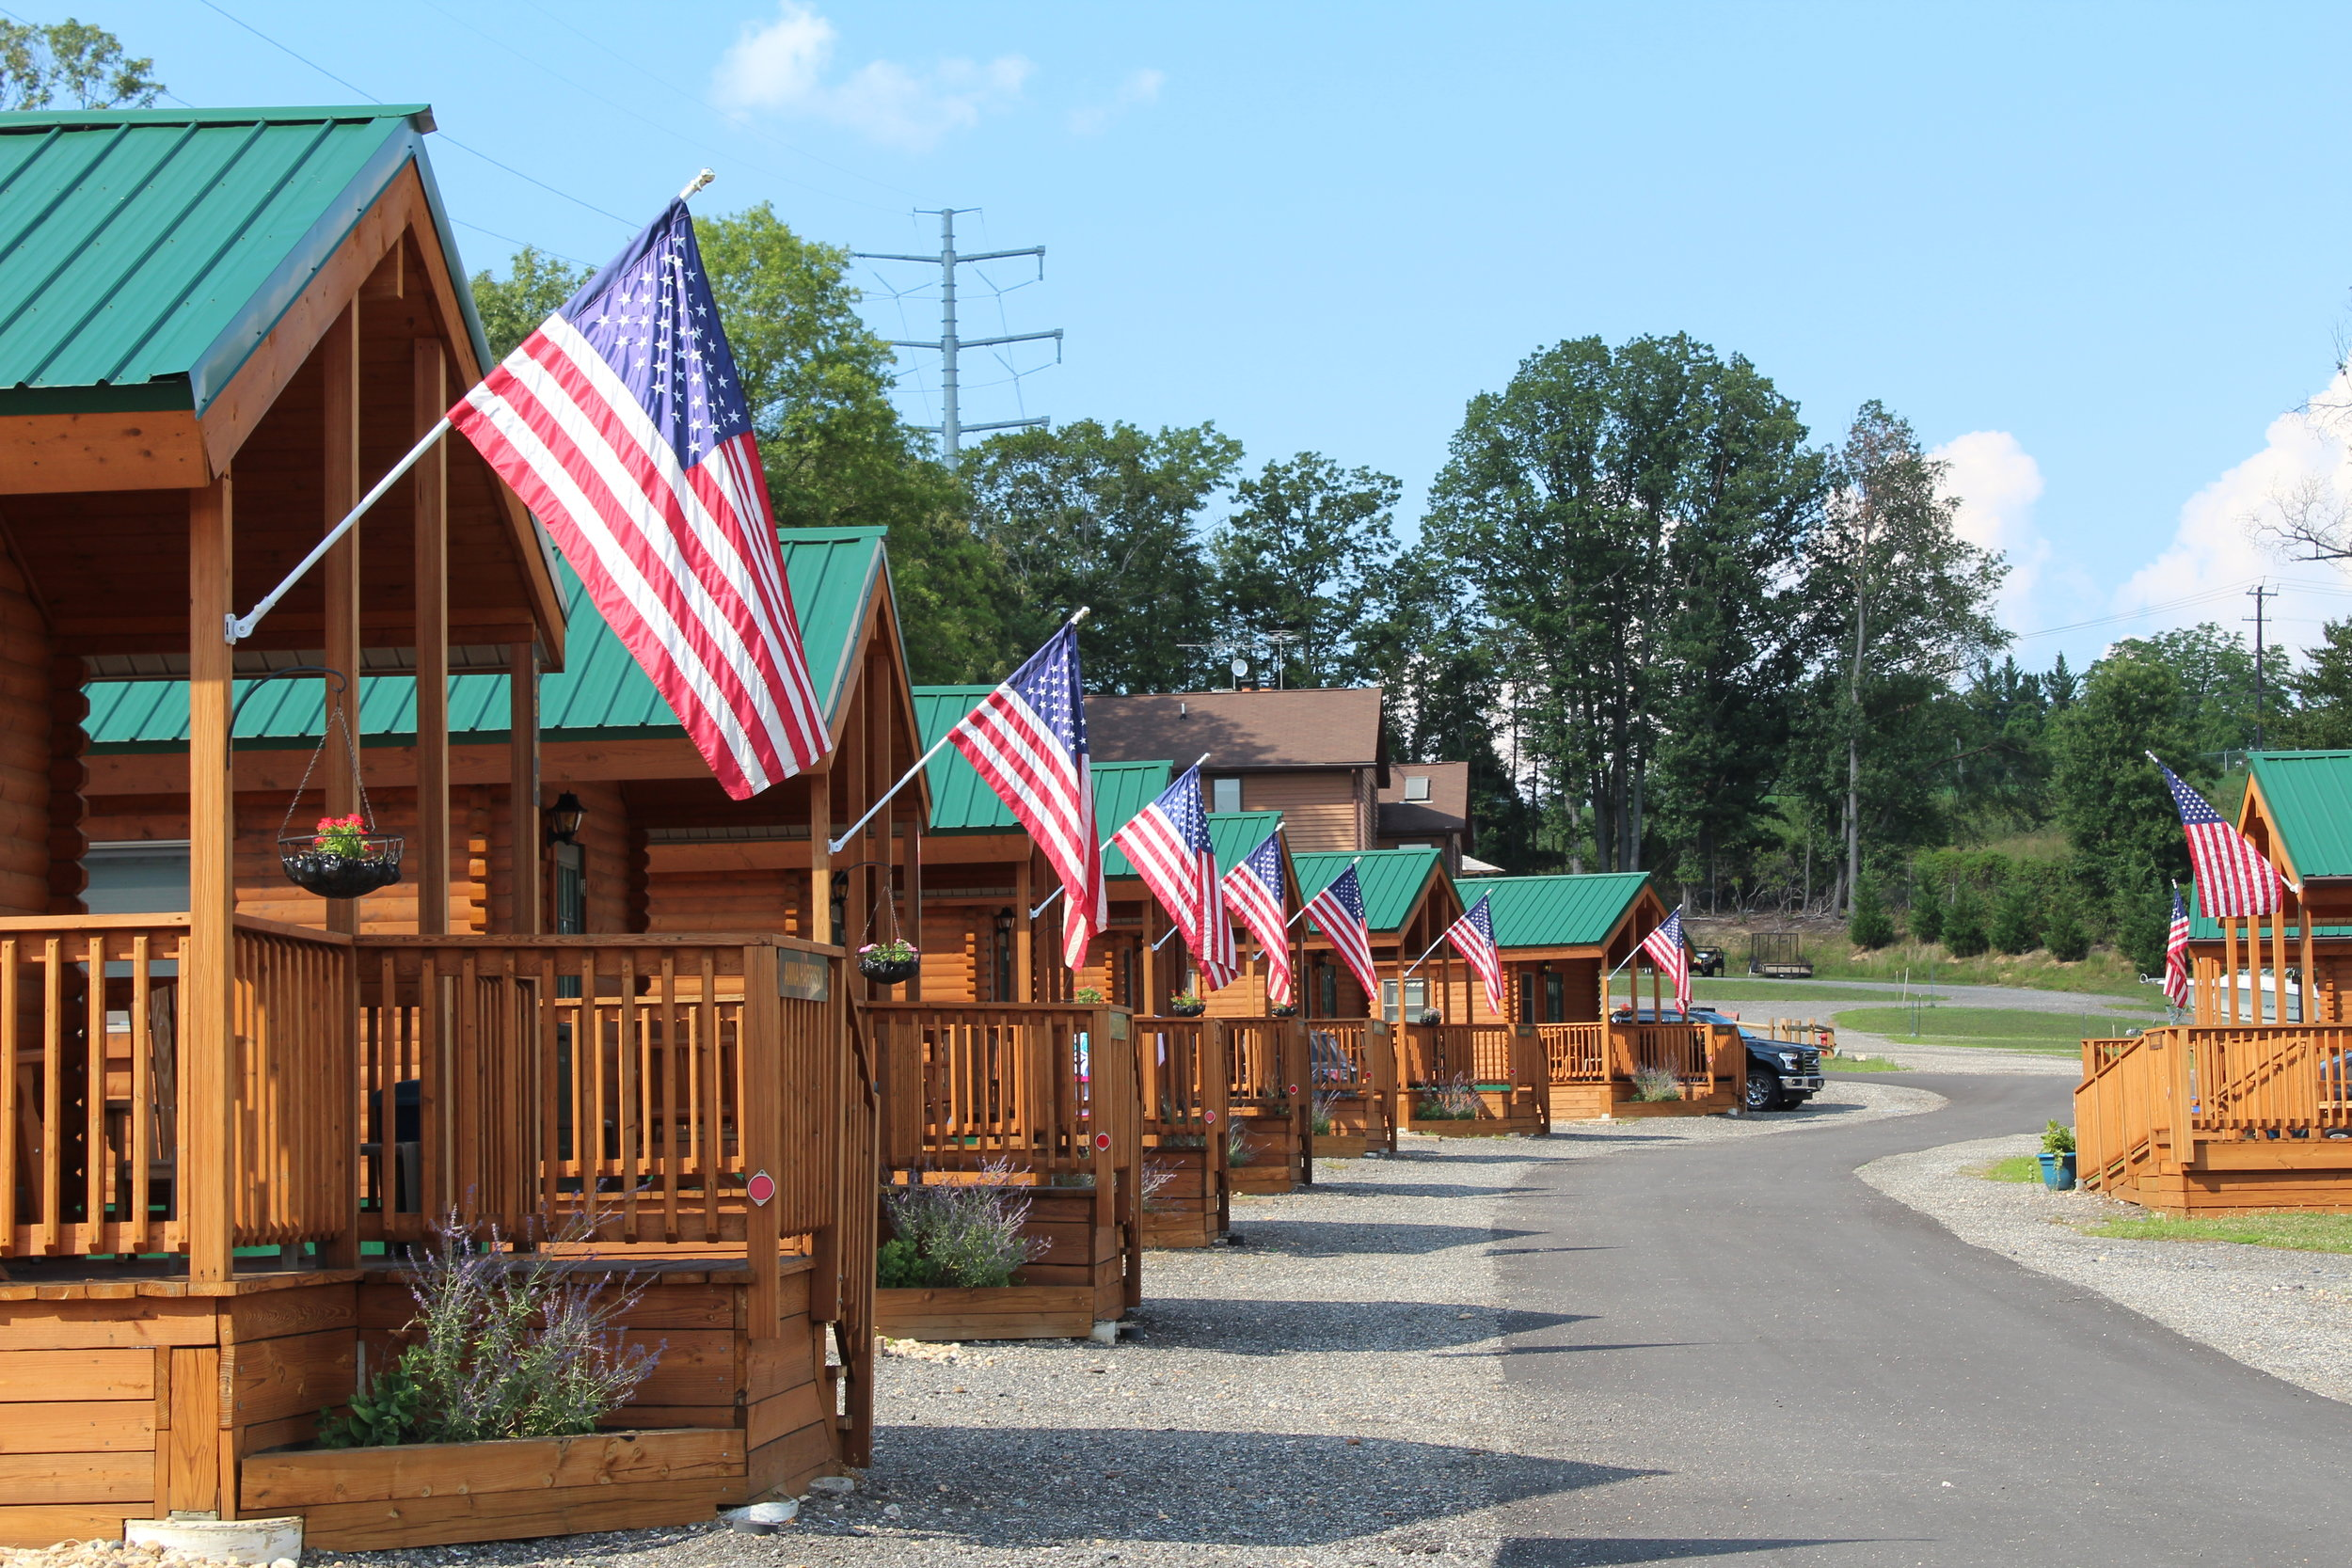 Premium Log Cabins at Cherry Hill Park